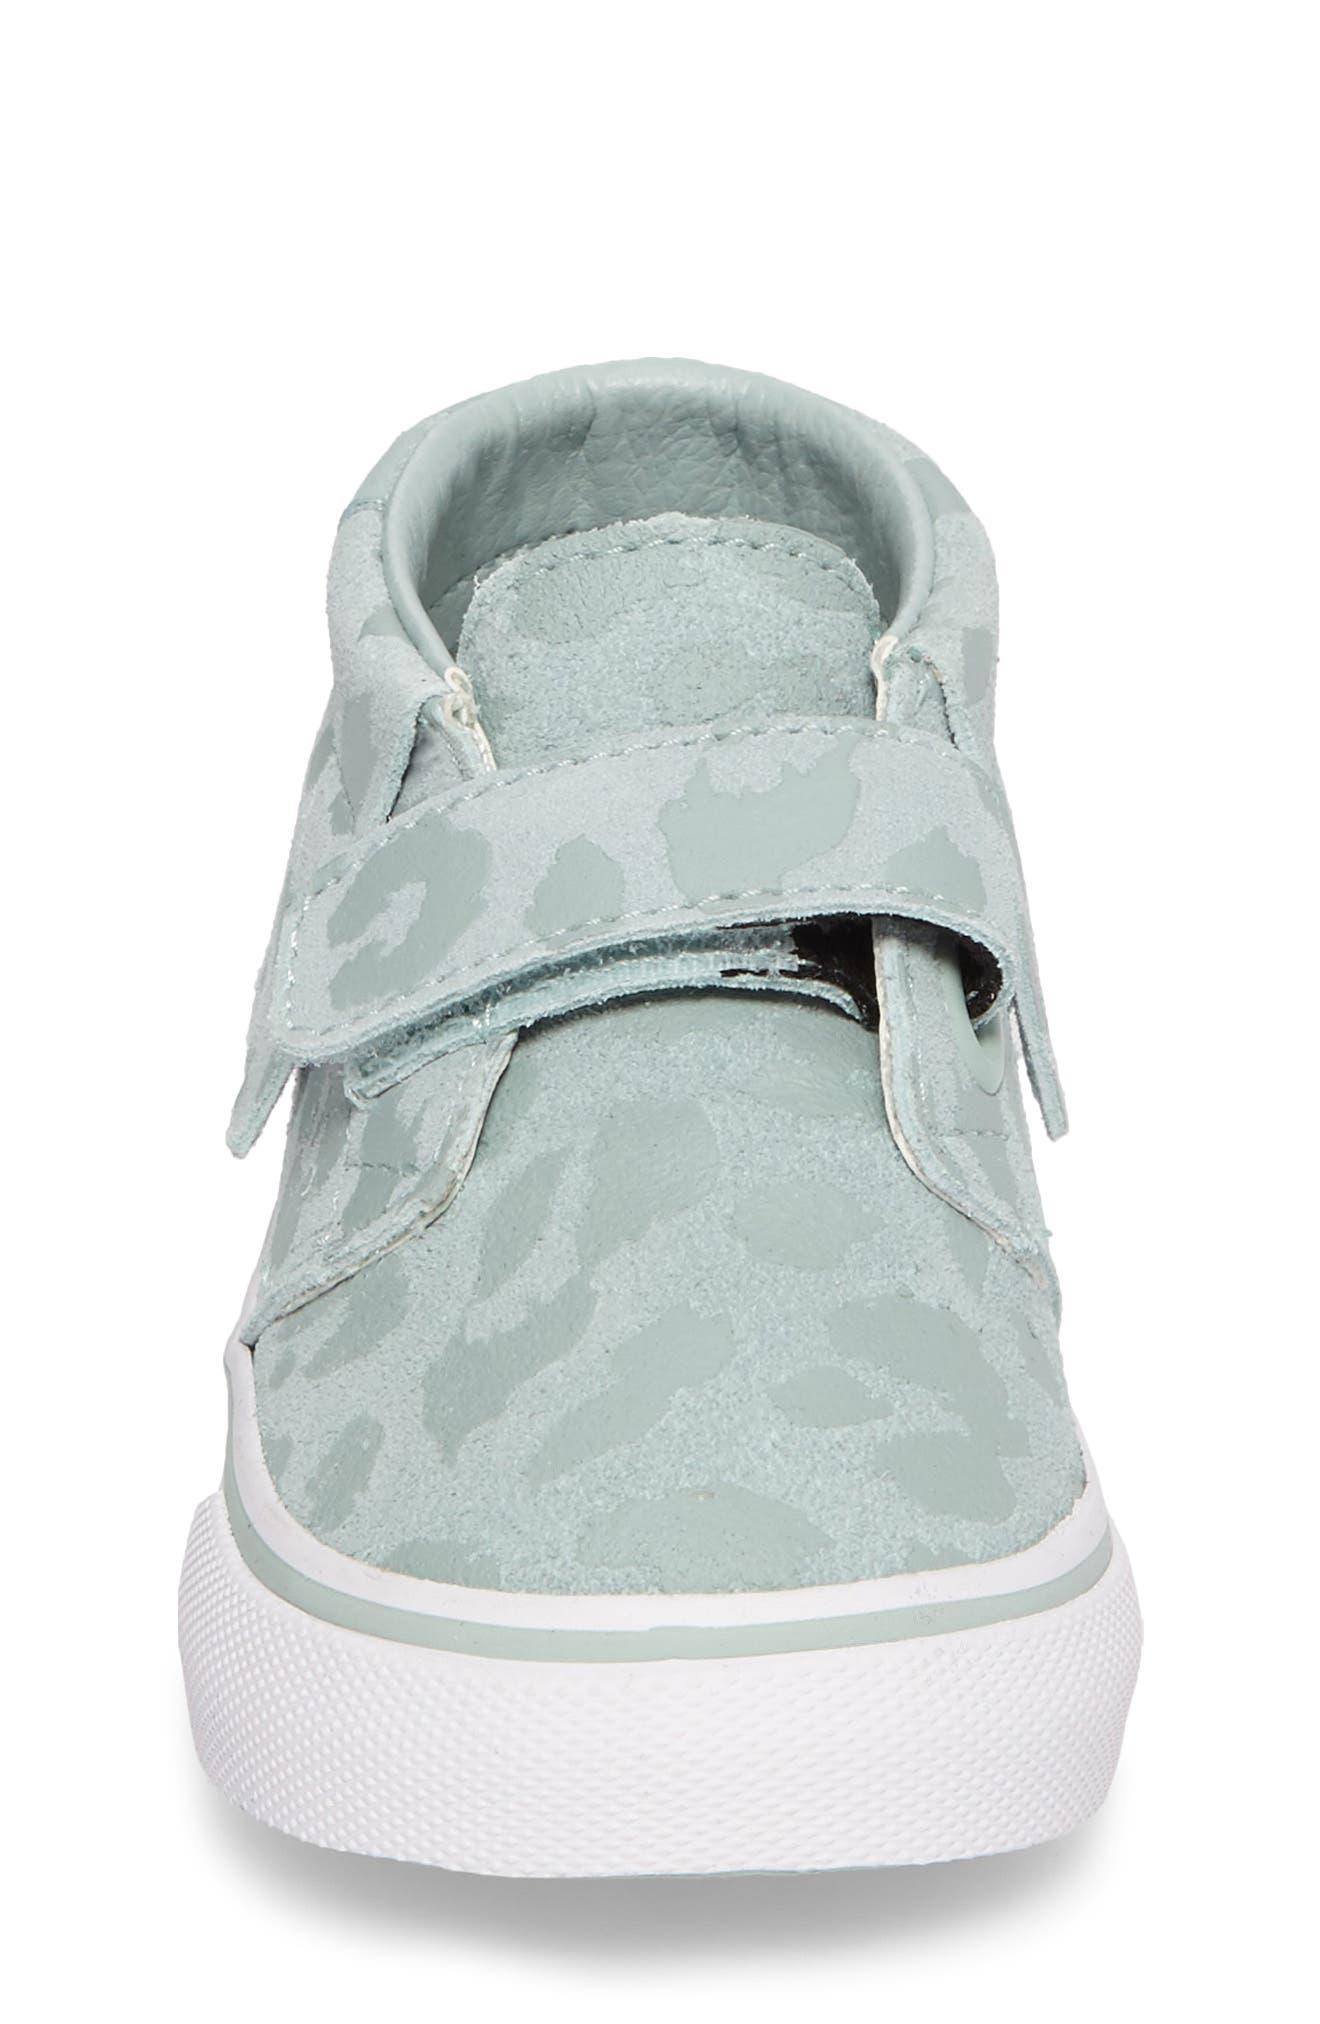 Chukka V Moc Sneaker,                             Alternate thumbnail 4, color,                             Harbor Gray Leopard Suede